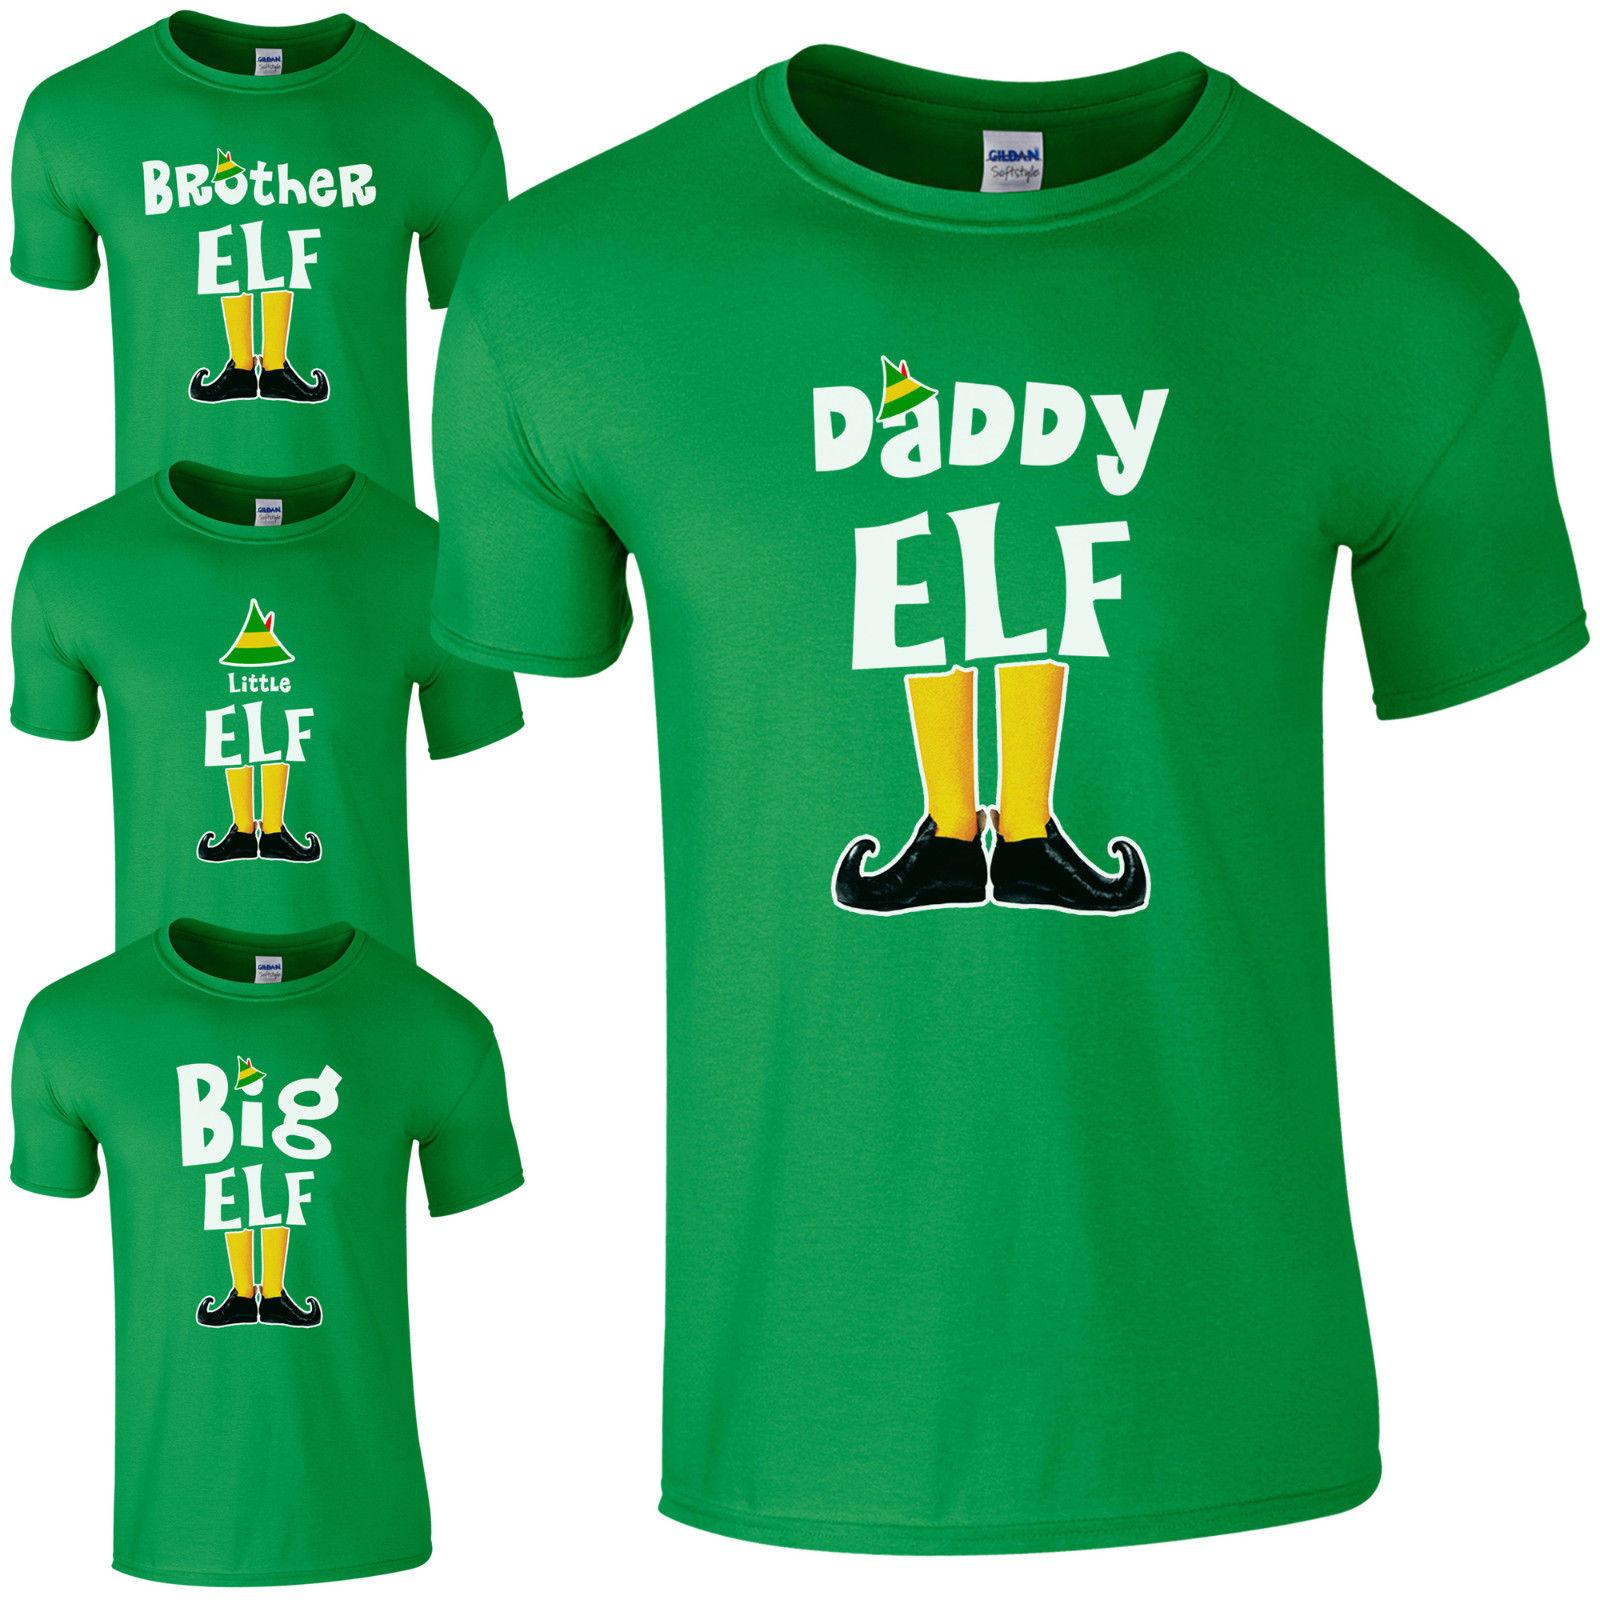 4367bfdde Elf Family T-Shirt - Funny Cute Christmas Pyjama PJ's Idea Gift Kids Mens  Top Funny free shipping Unisex Casual Tshirt